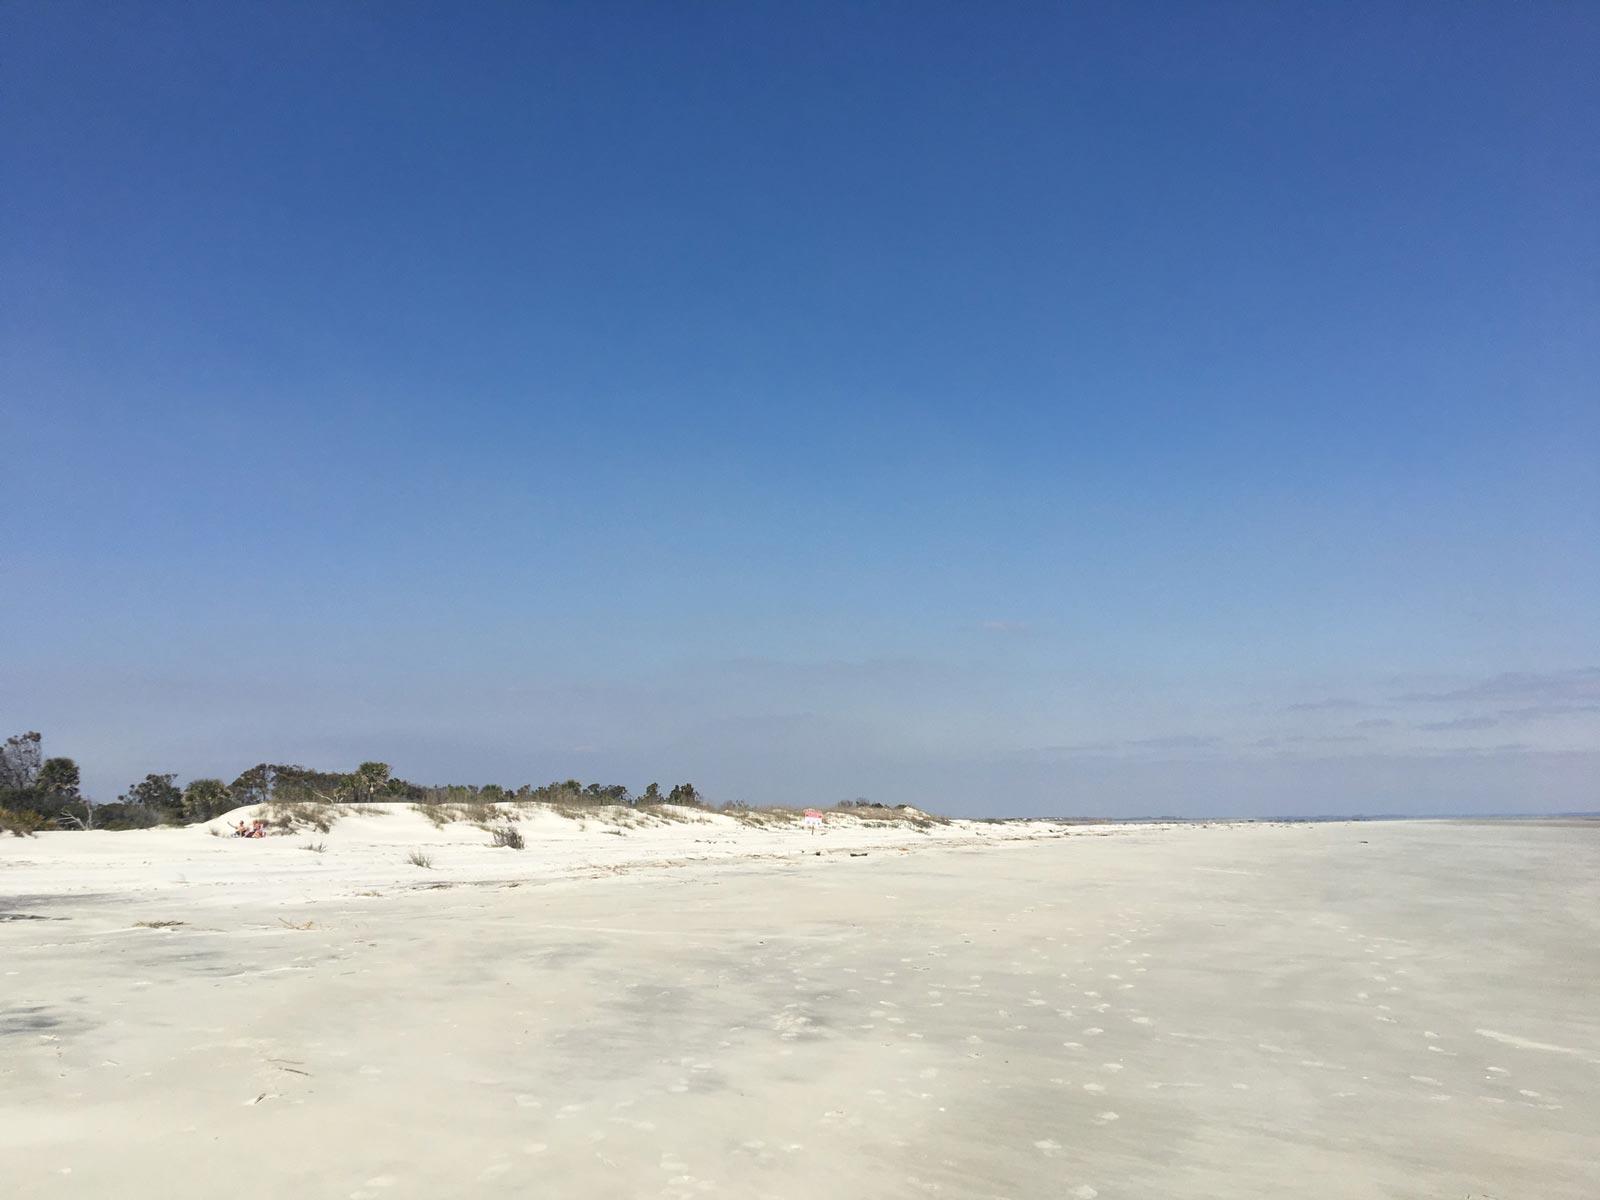 Beach front at Hunting Island State Park, South Carolina